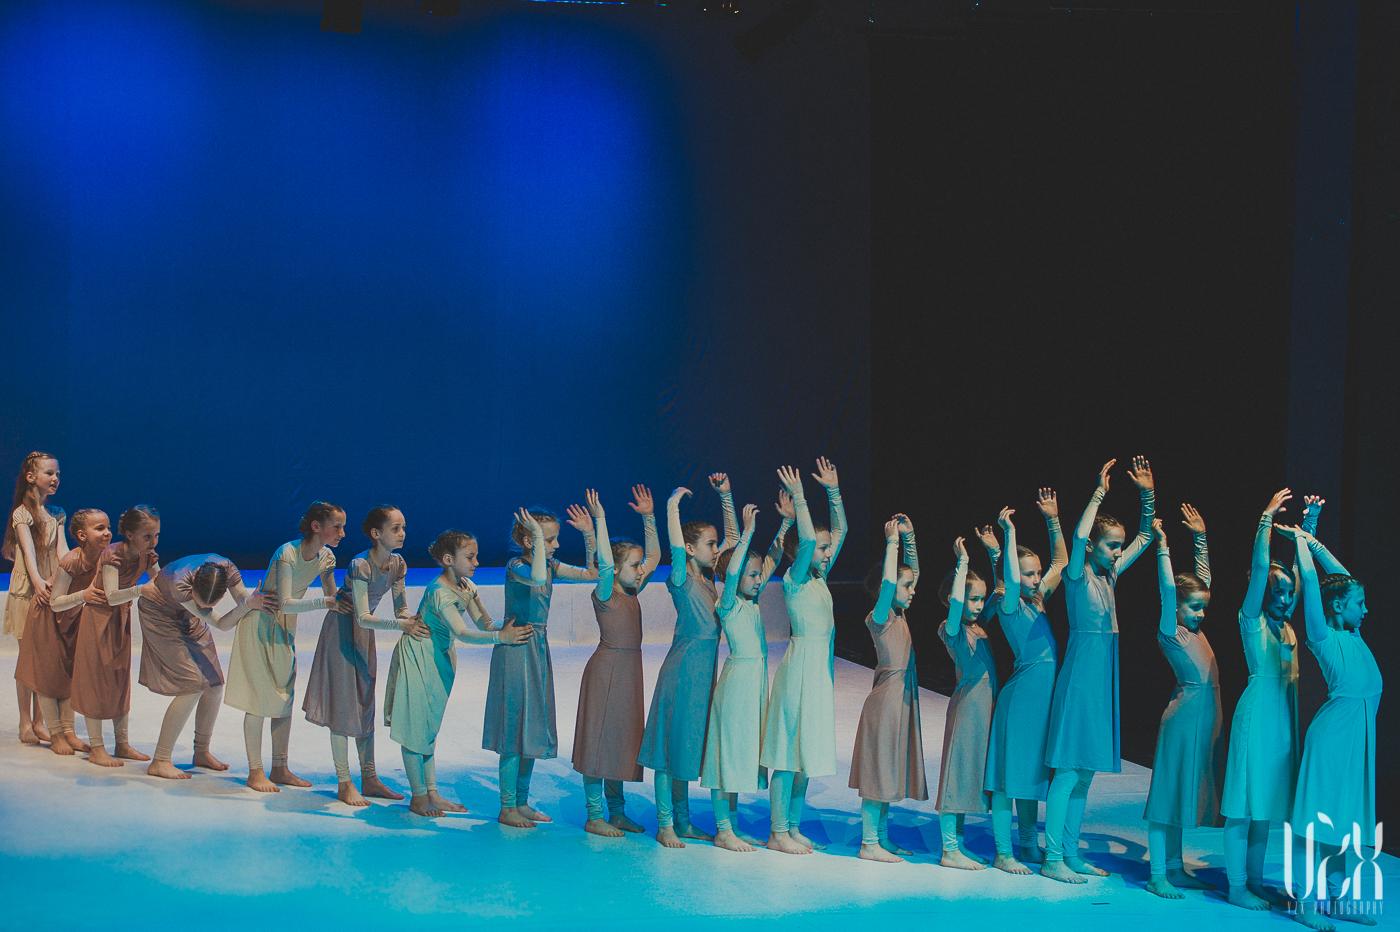 E.sabaliauskaite Vzx.lt Dance Judesio Erdve 02